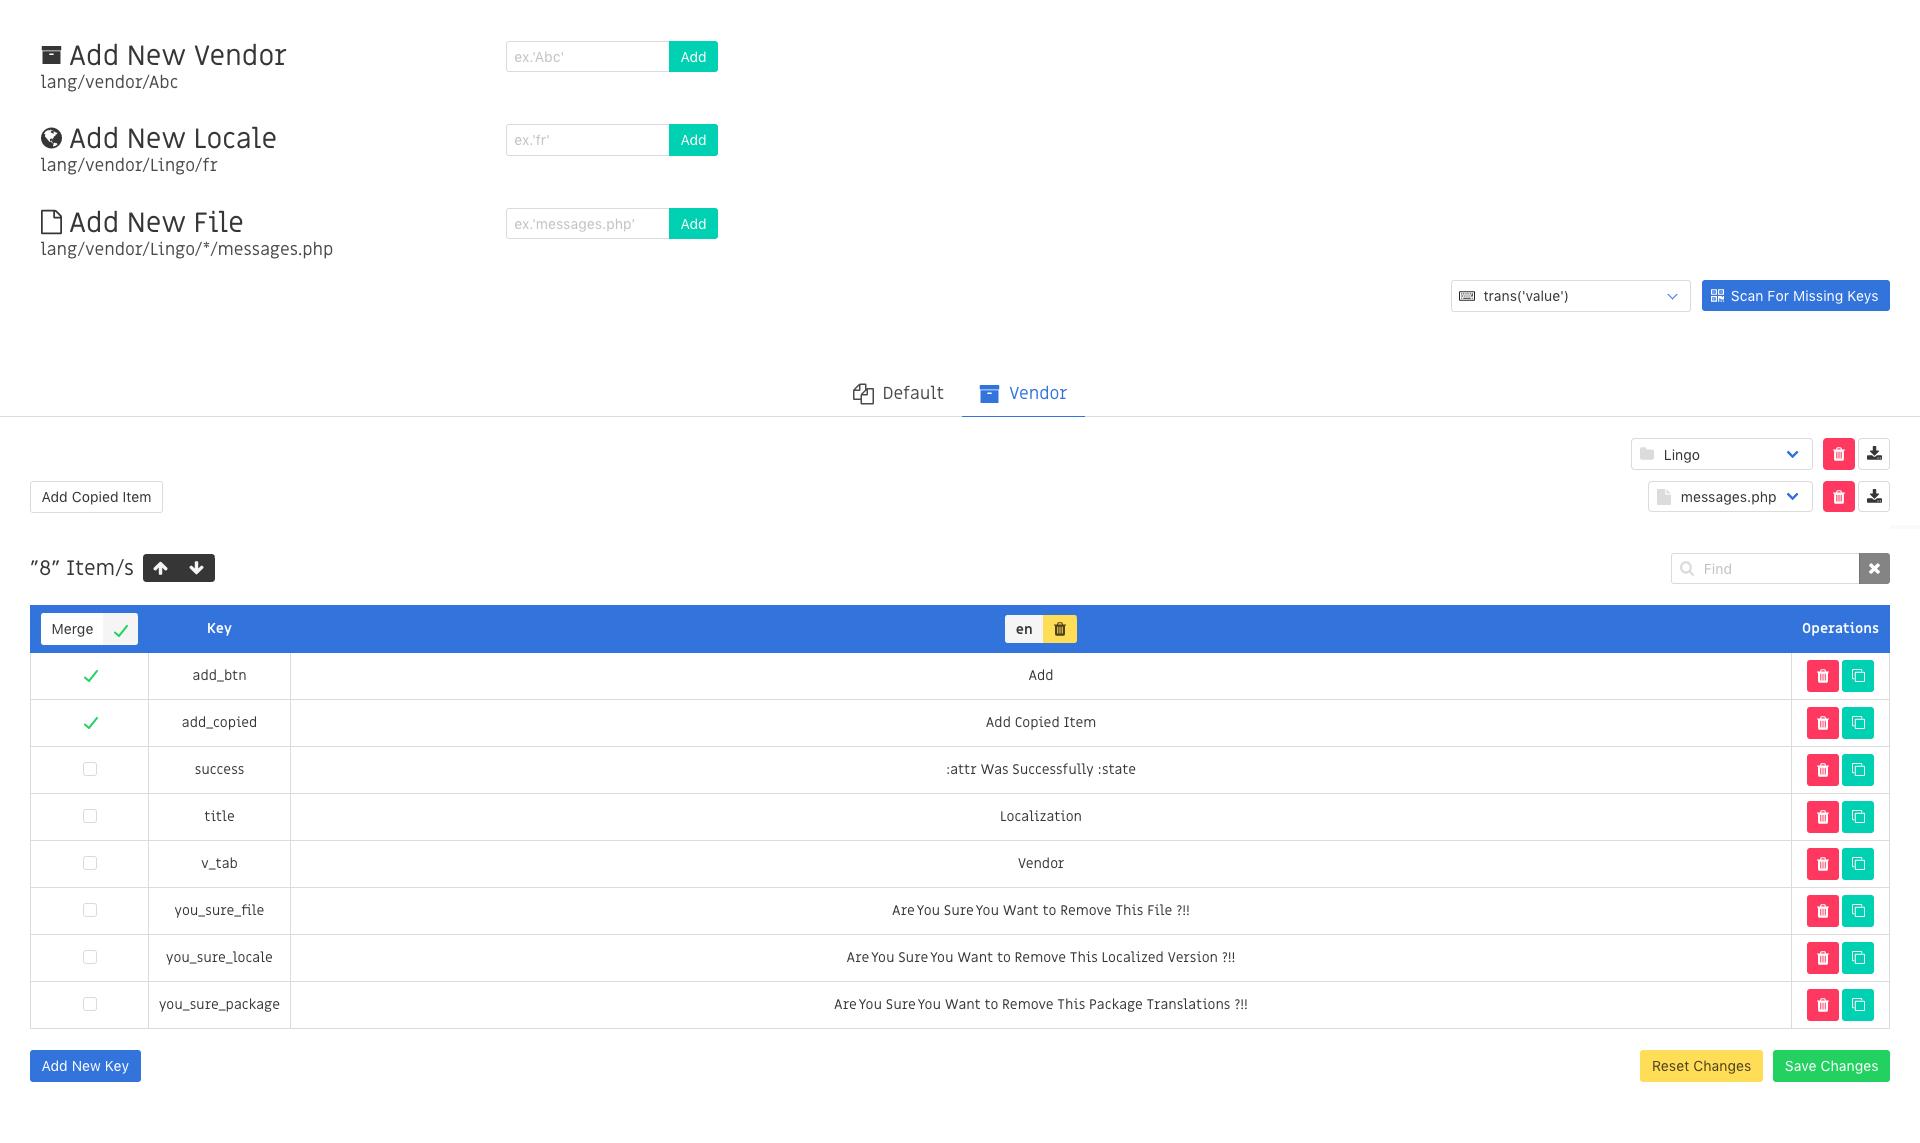 GitHub - ctf0/Lingo: A Gui To Manage Laravel Translation Files